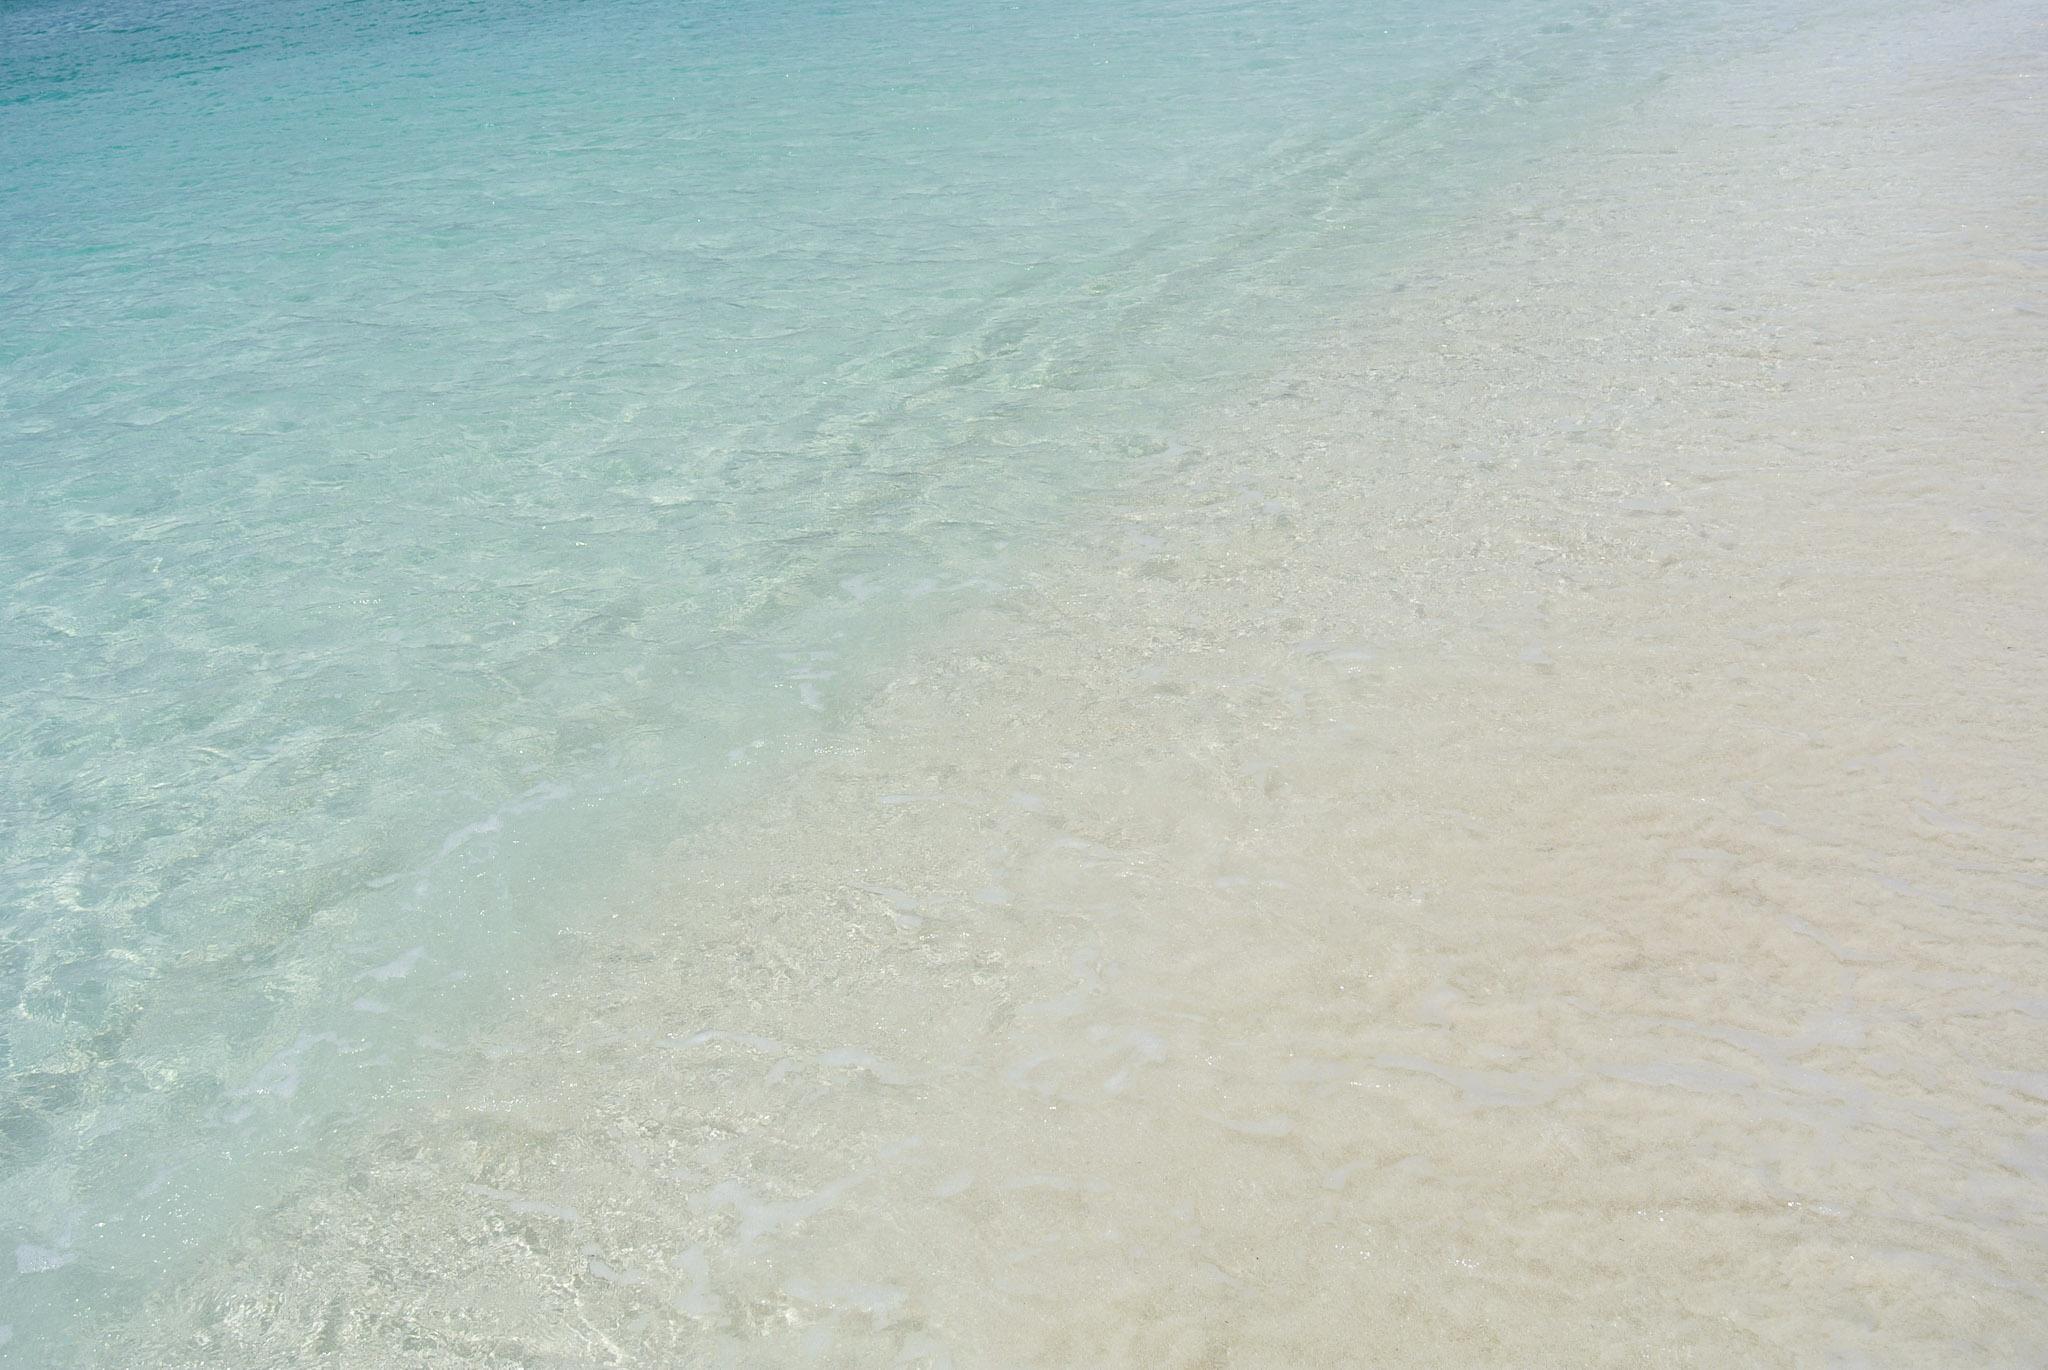 Club Med Turks & Caicos - 2013